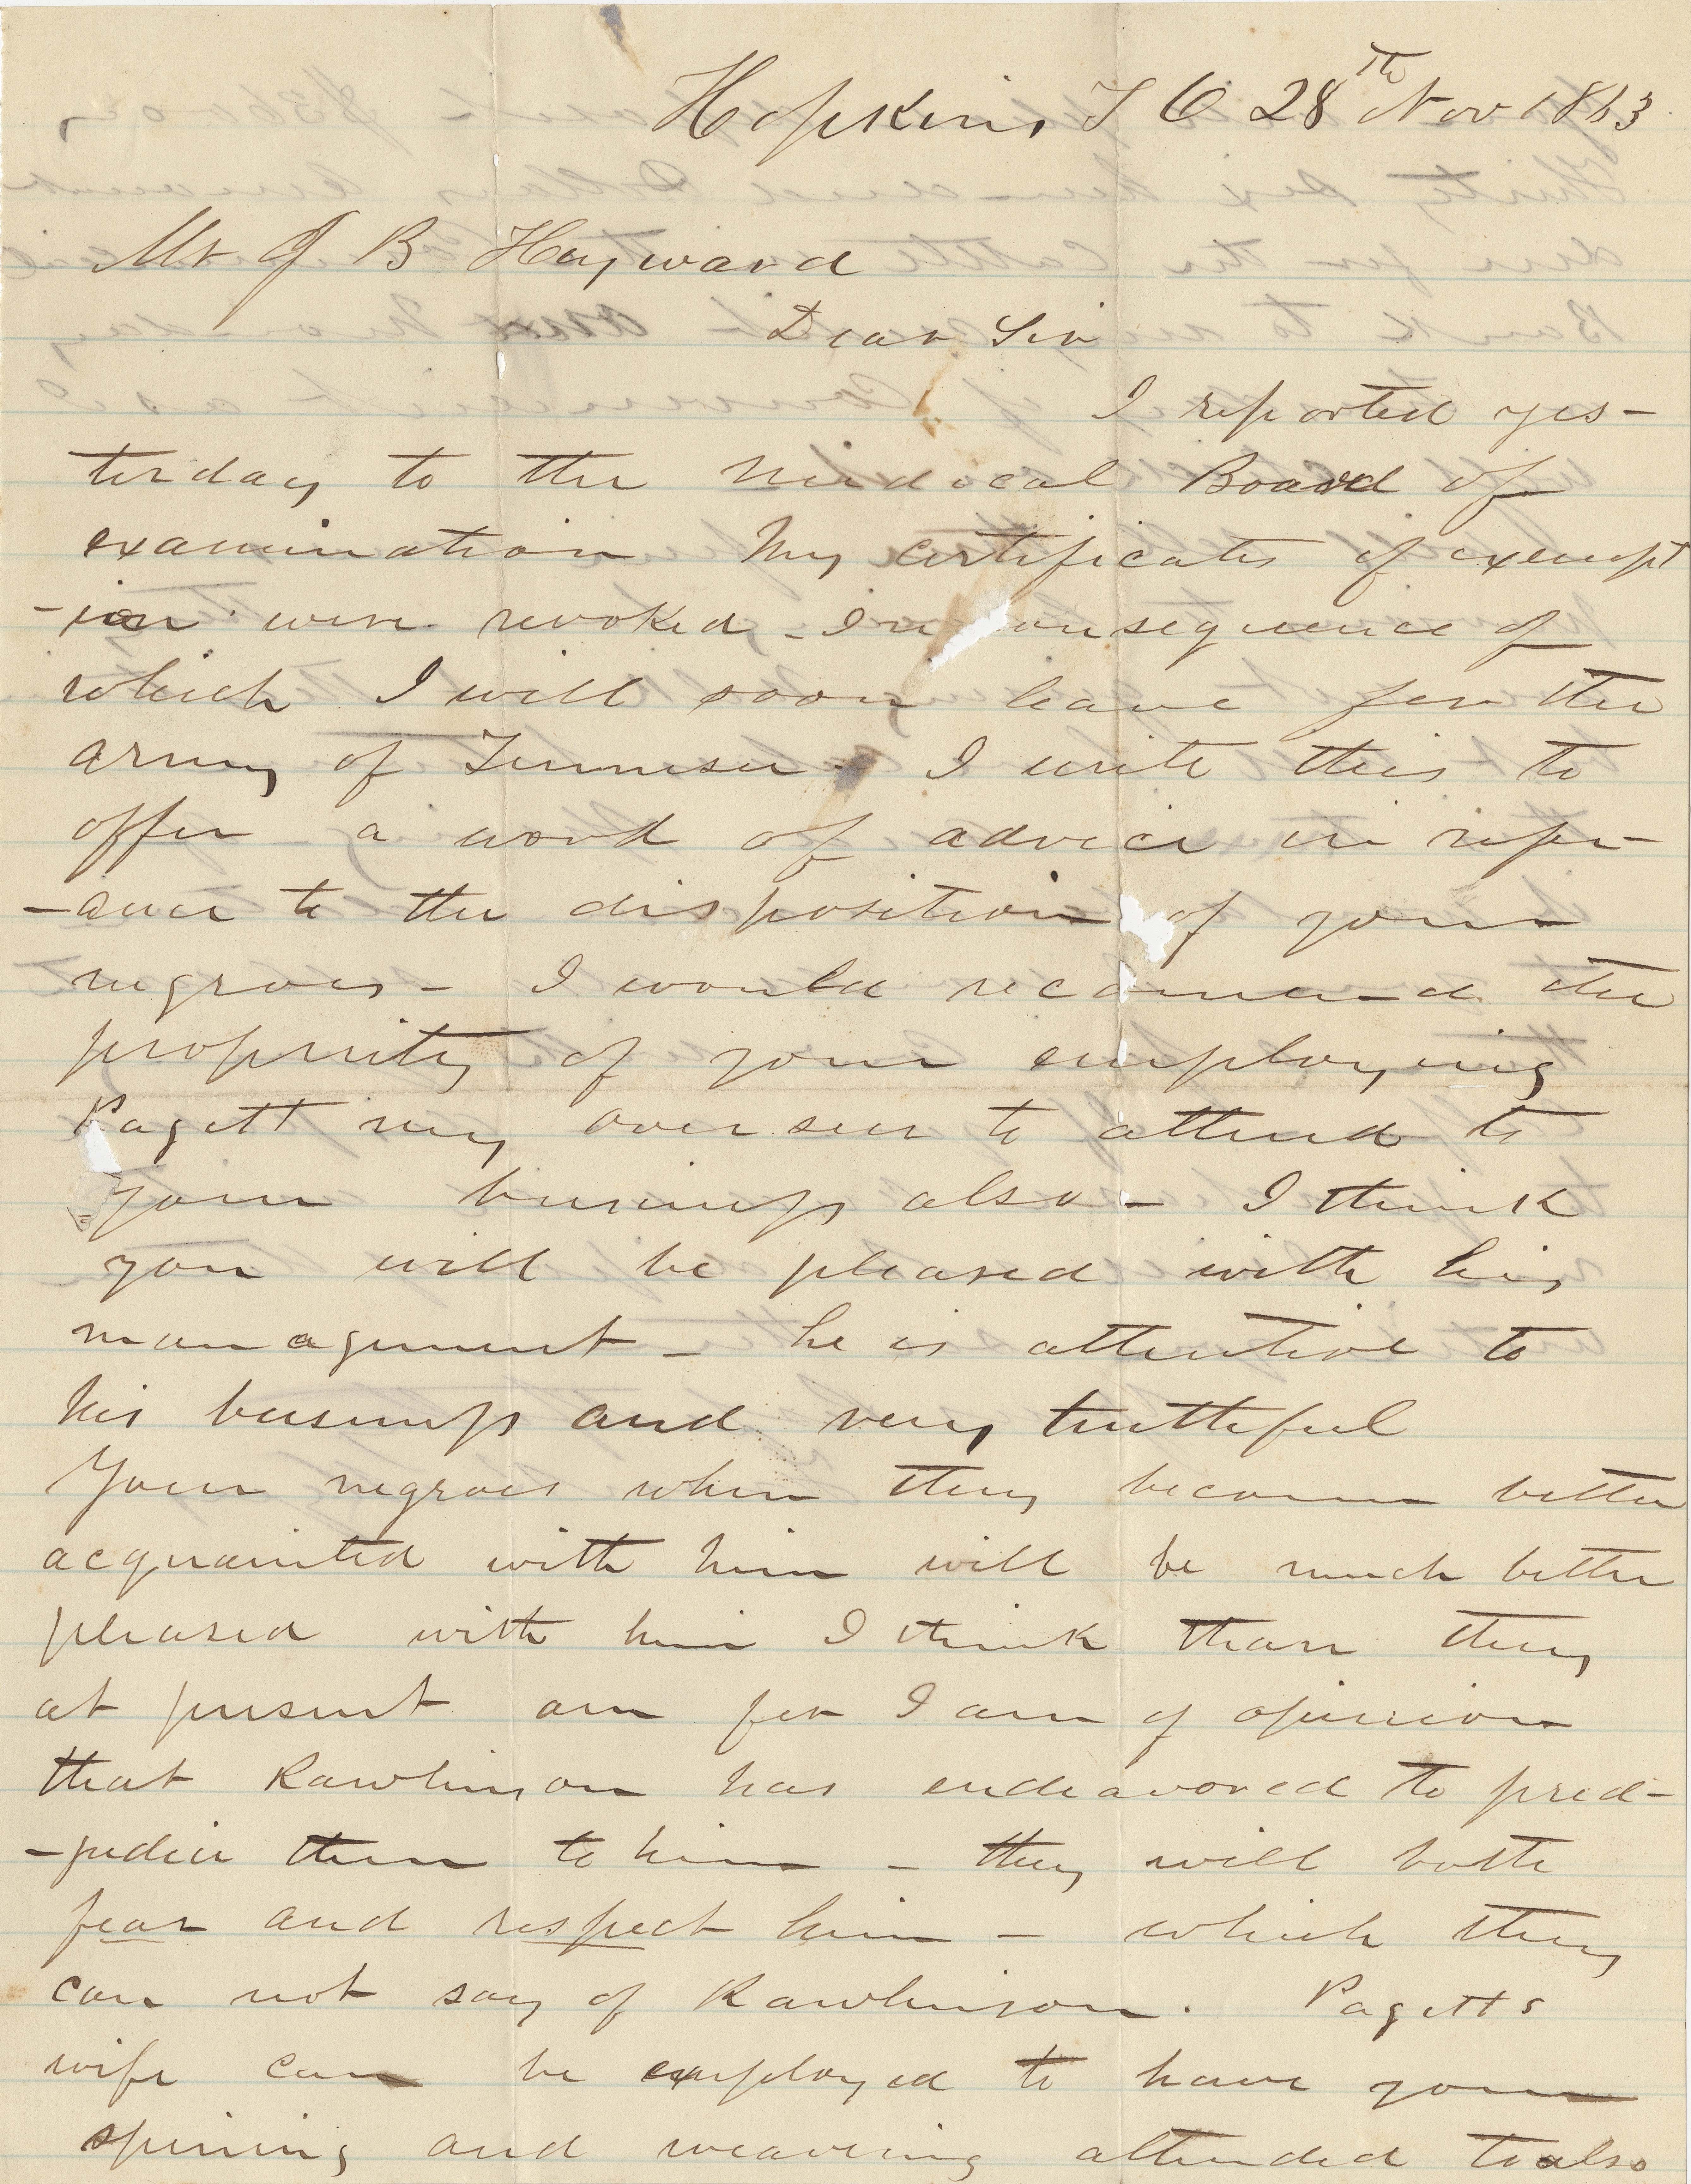 205. Frank Myers to James B. Heyward -- November 28, 1863